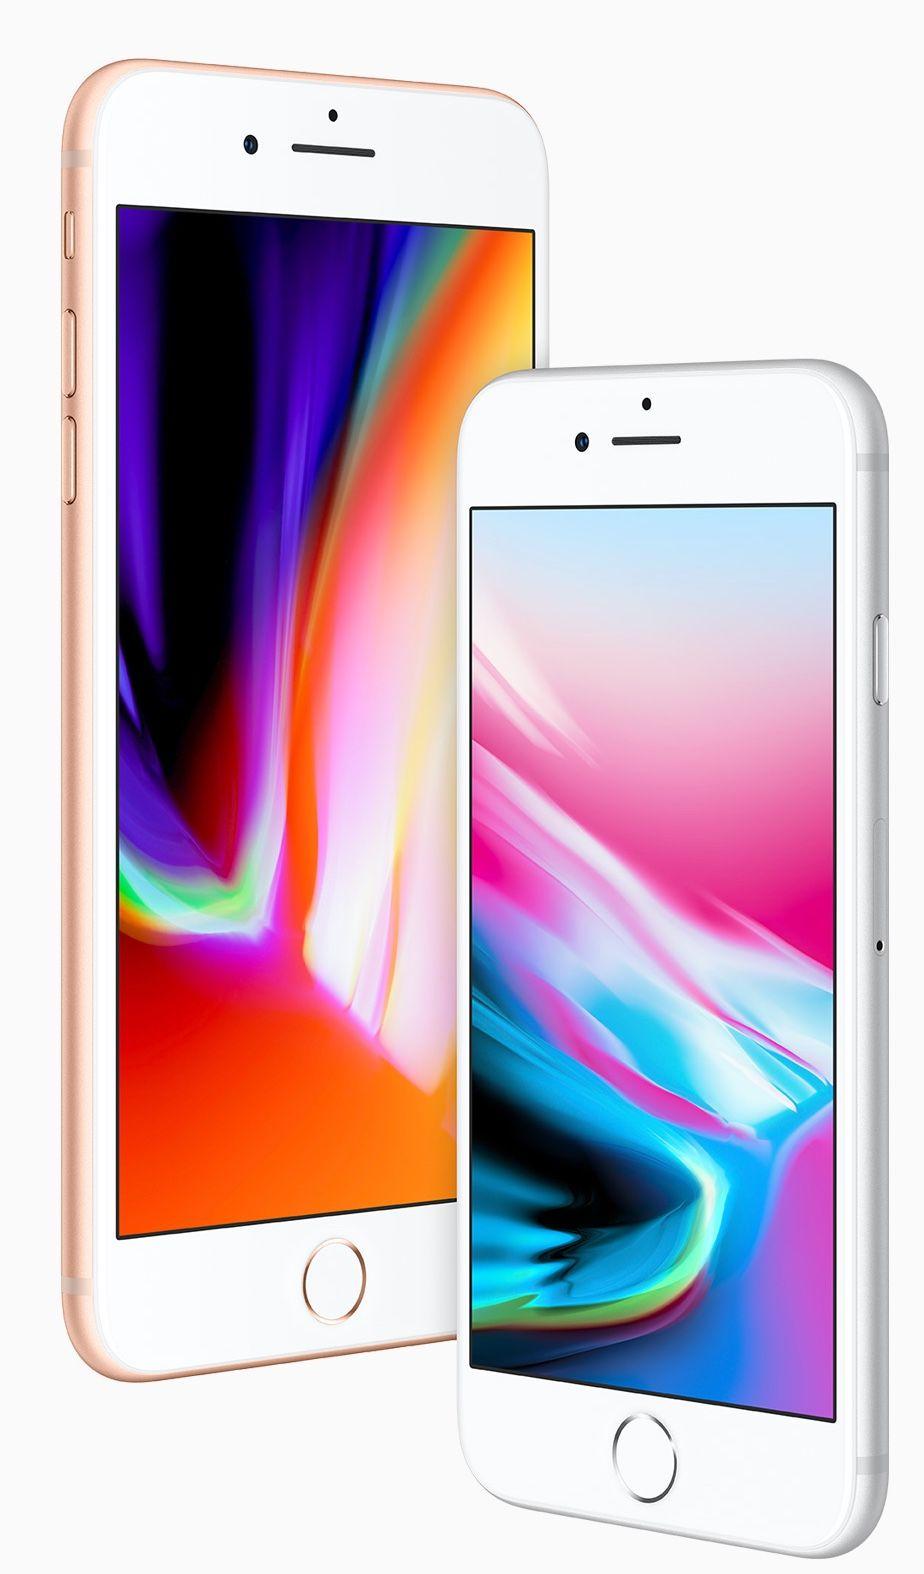 Apple A أبل إصلاح قادم ل فون 8 قضية سماعة الأذن طقطقةfix Is Coming For The Iphone 8 Crackling Earpiece Issue Iphone Apple Iphone Iphone 8 Plus